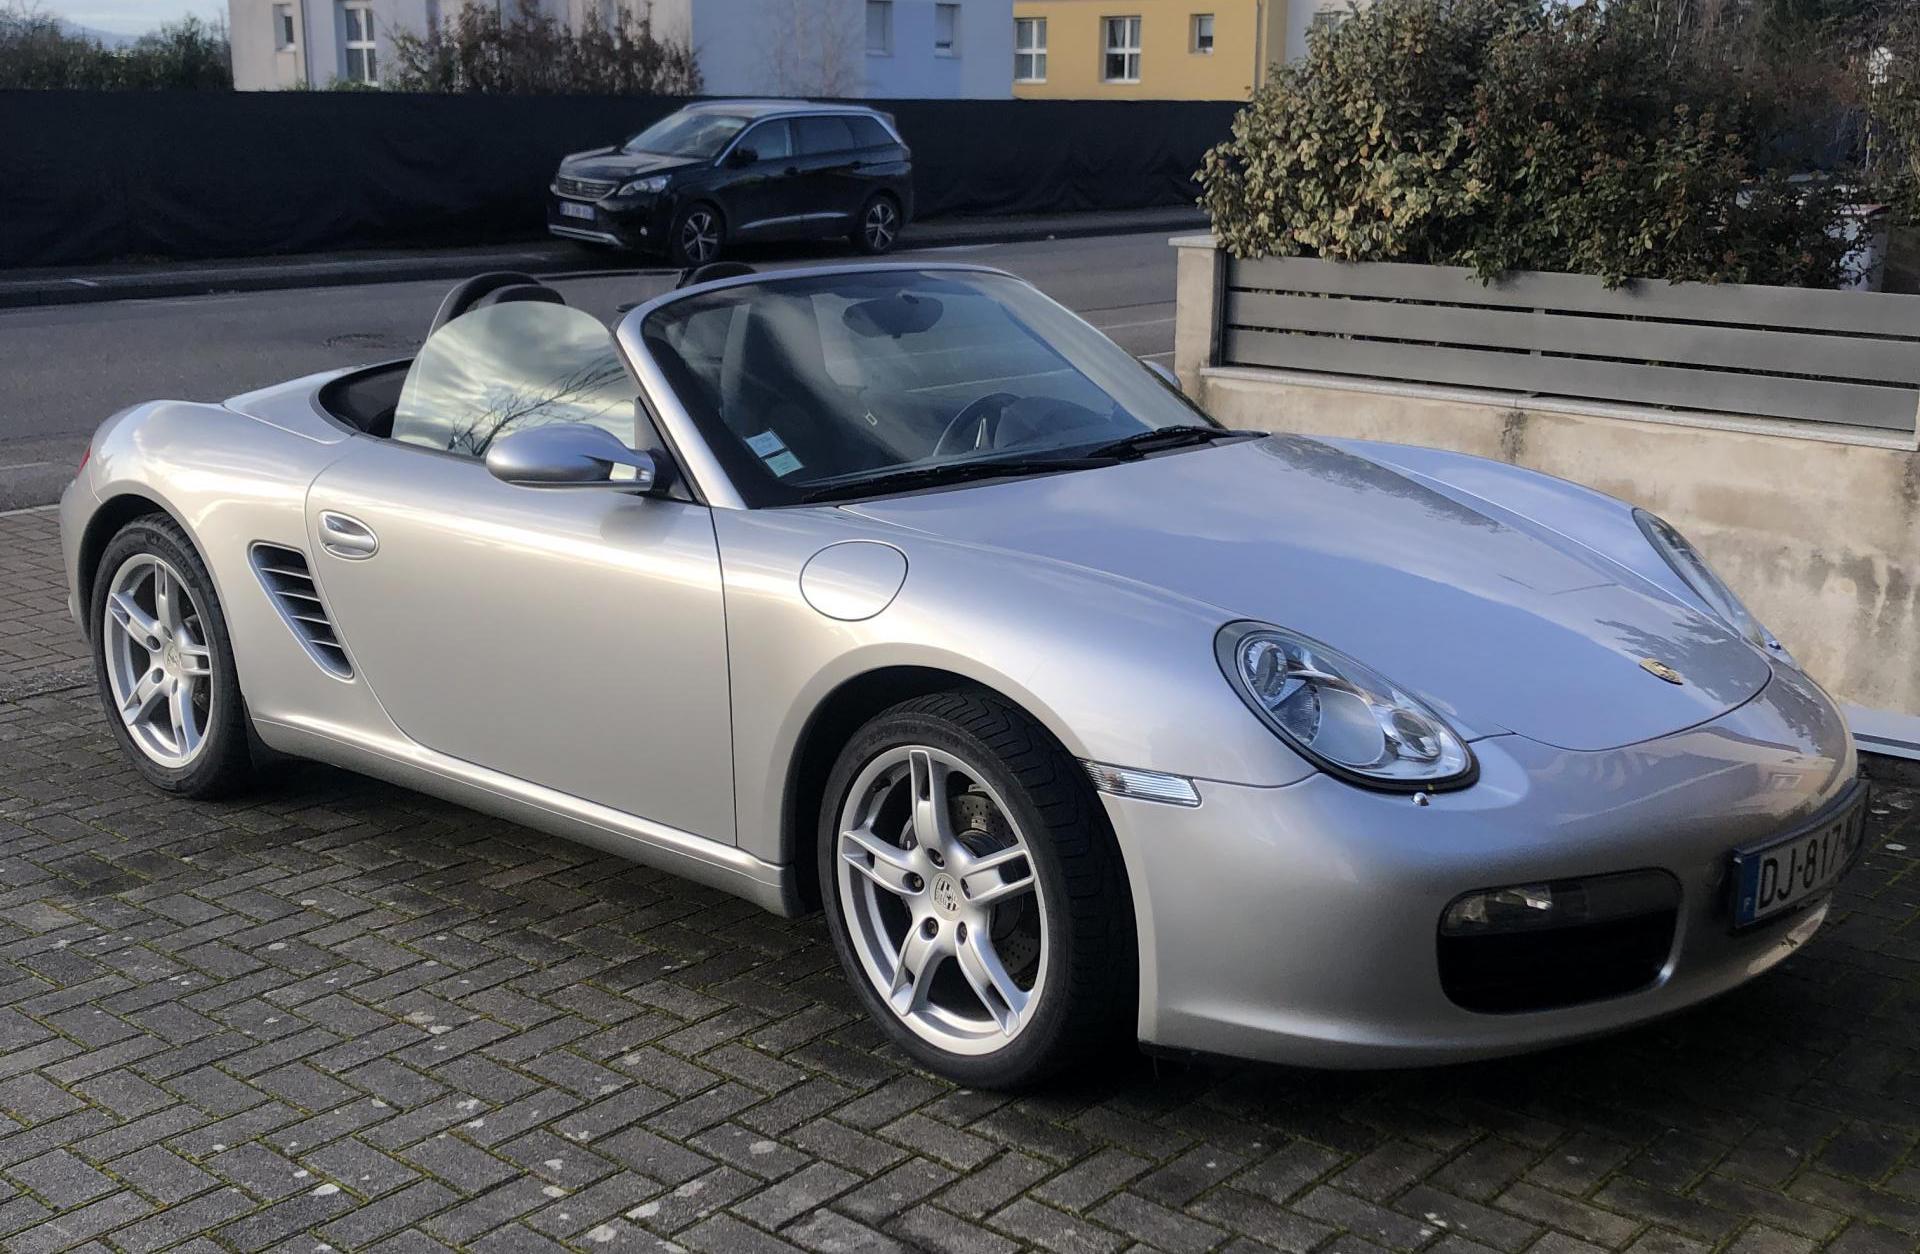 Porsche Boxster 987 2.7 245 ch (Boxster)